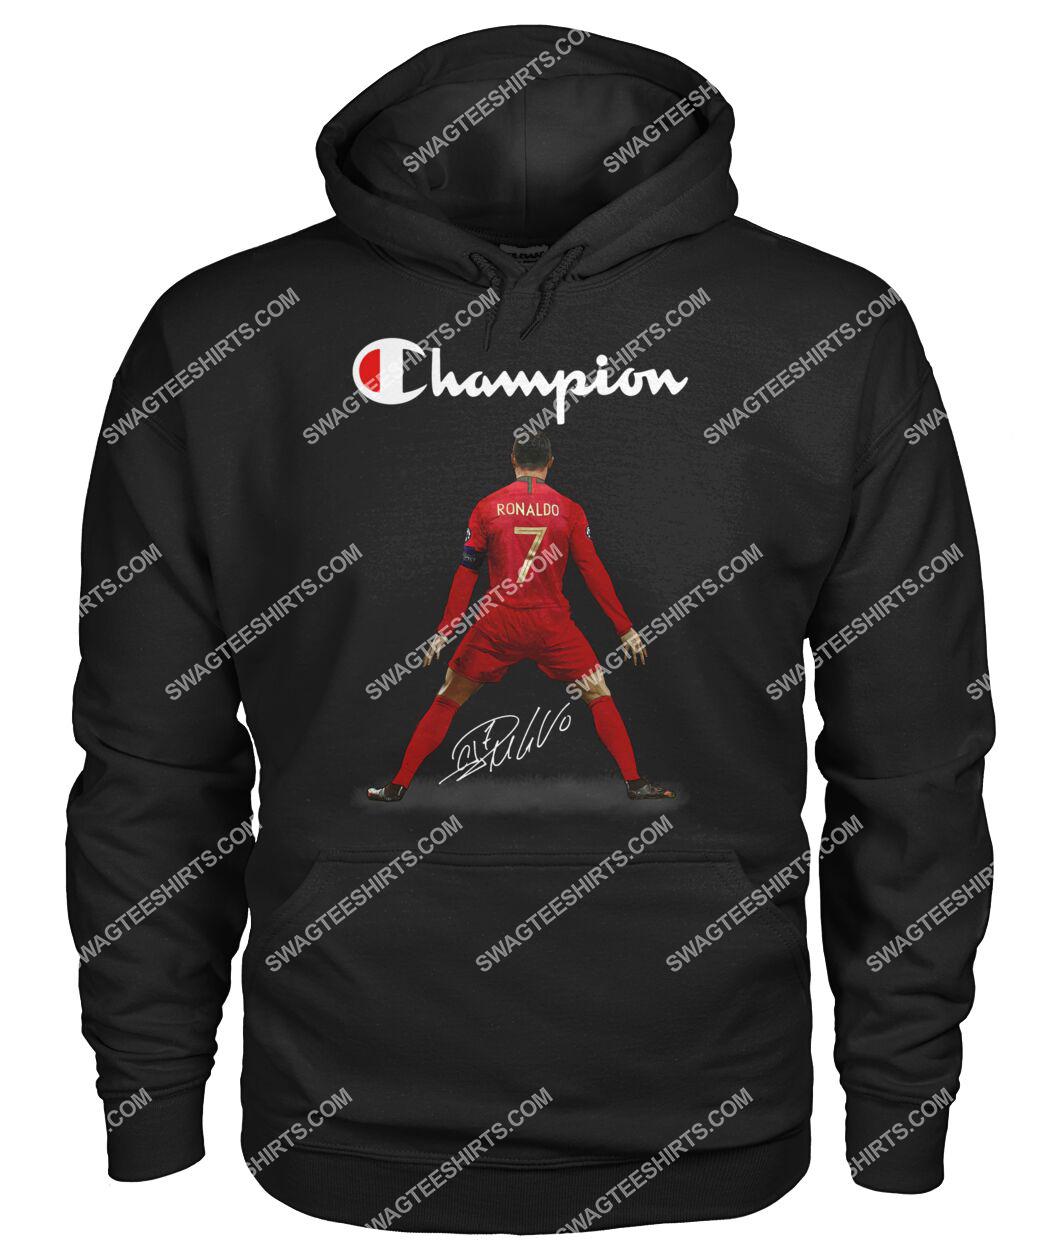 champion cristiano ronaldo signature hoodie 1